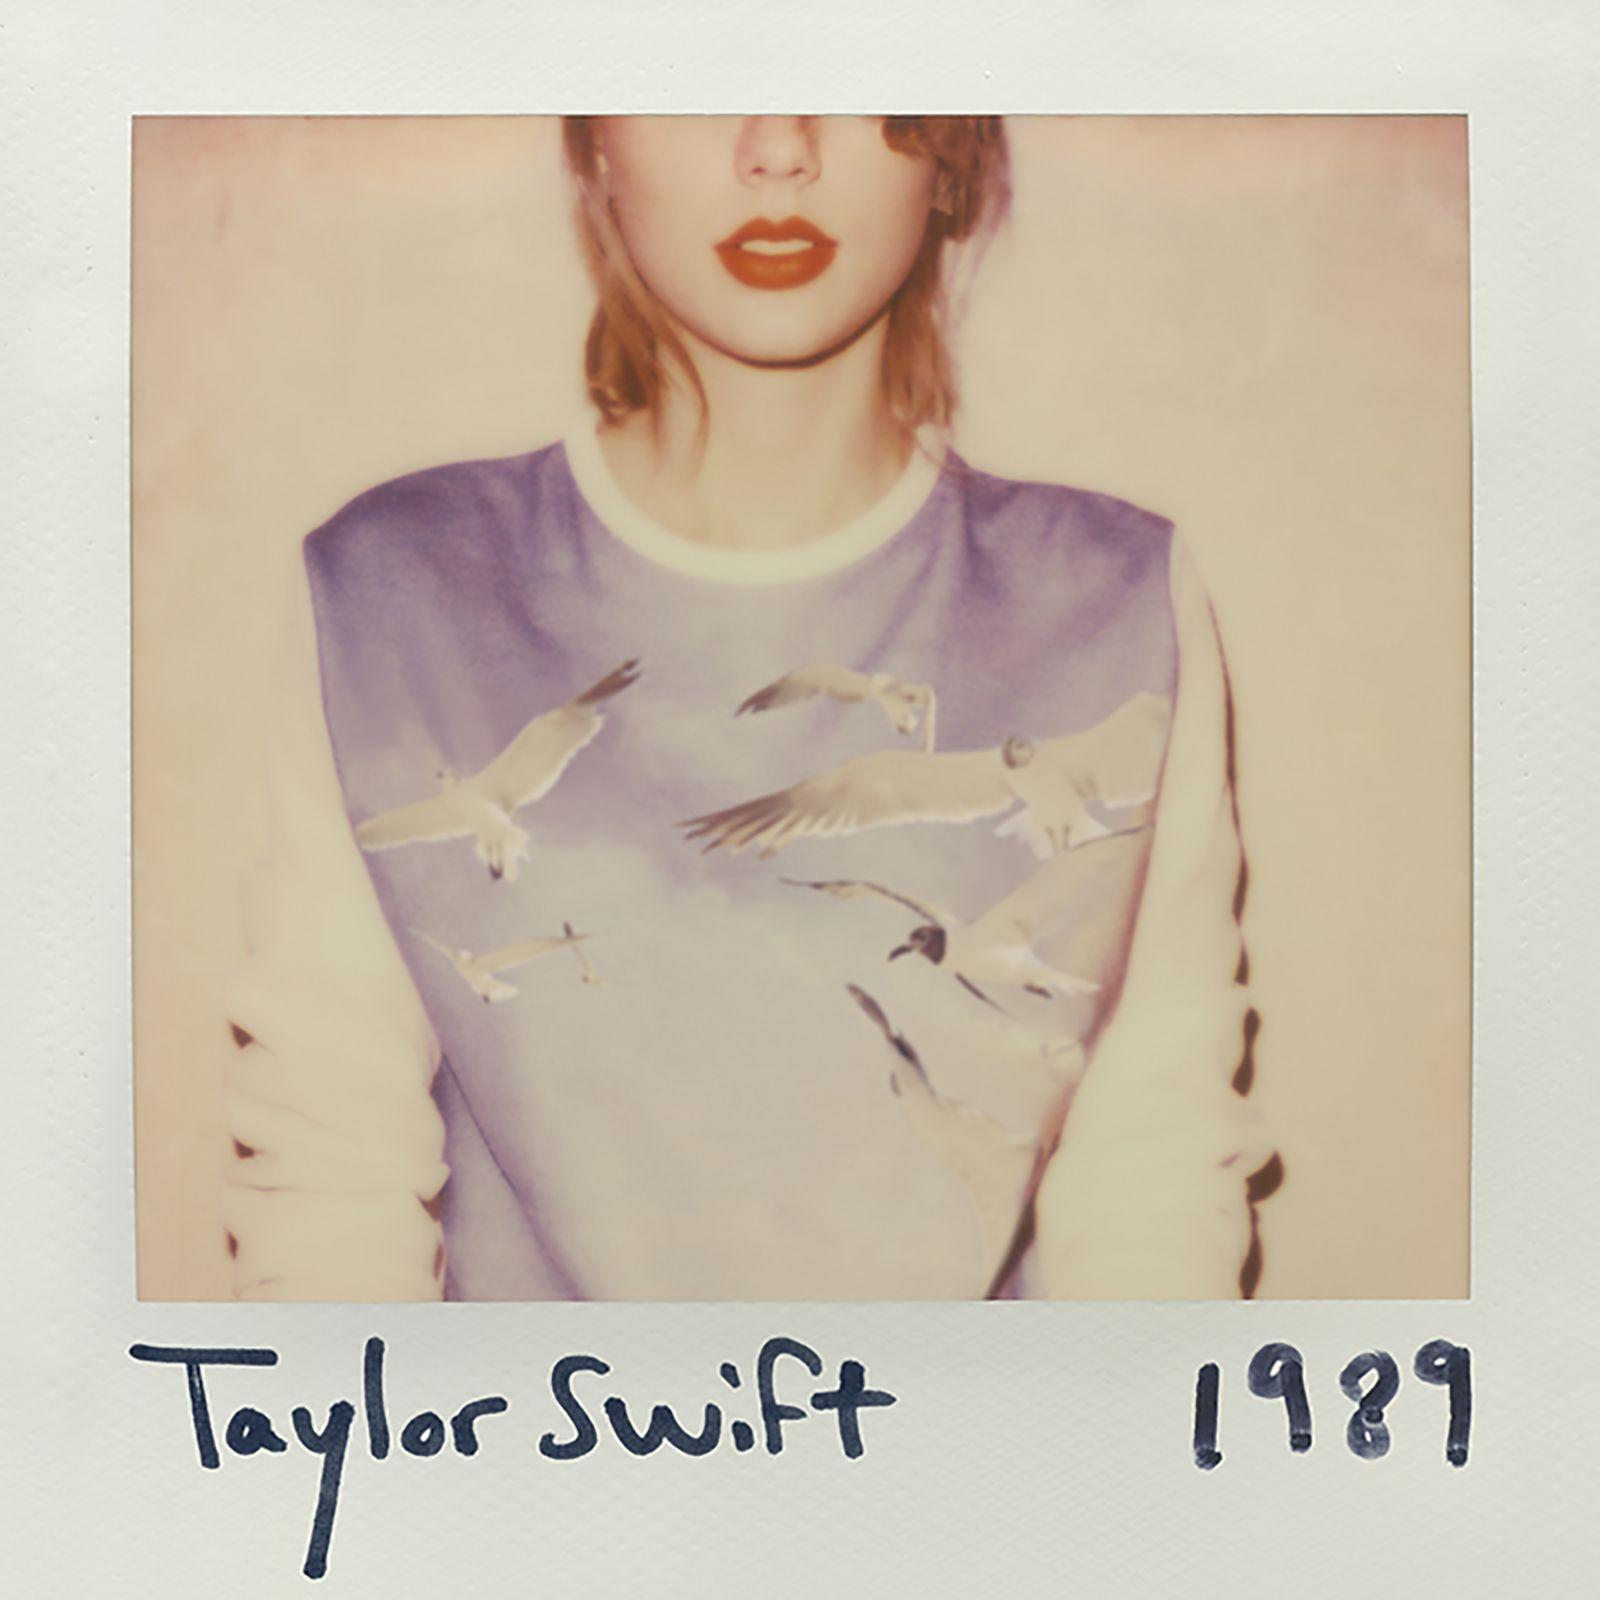 Taylor-Swift-1989-Cover-Standard.jpg